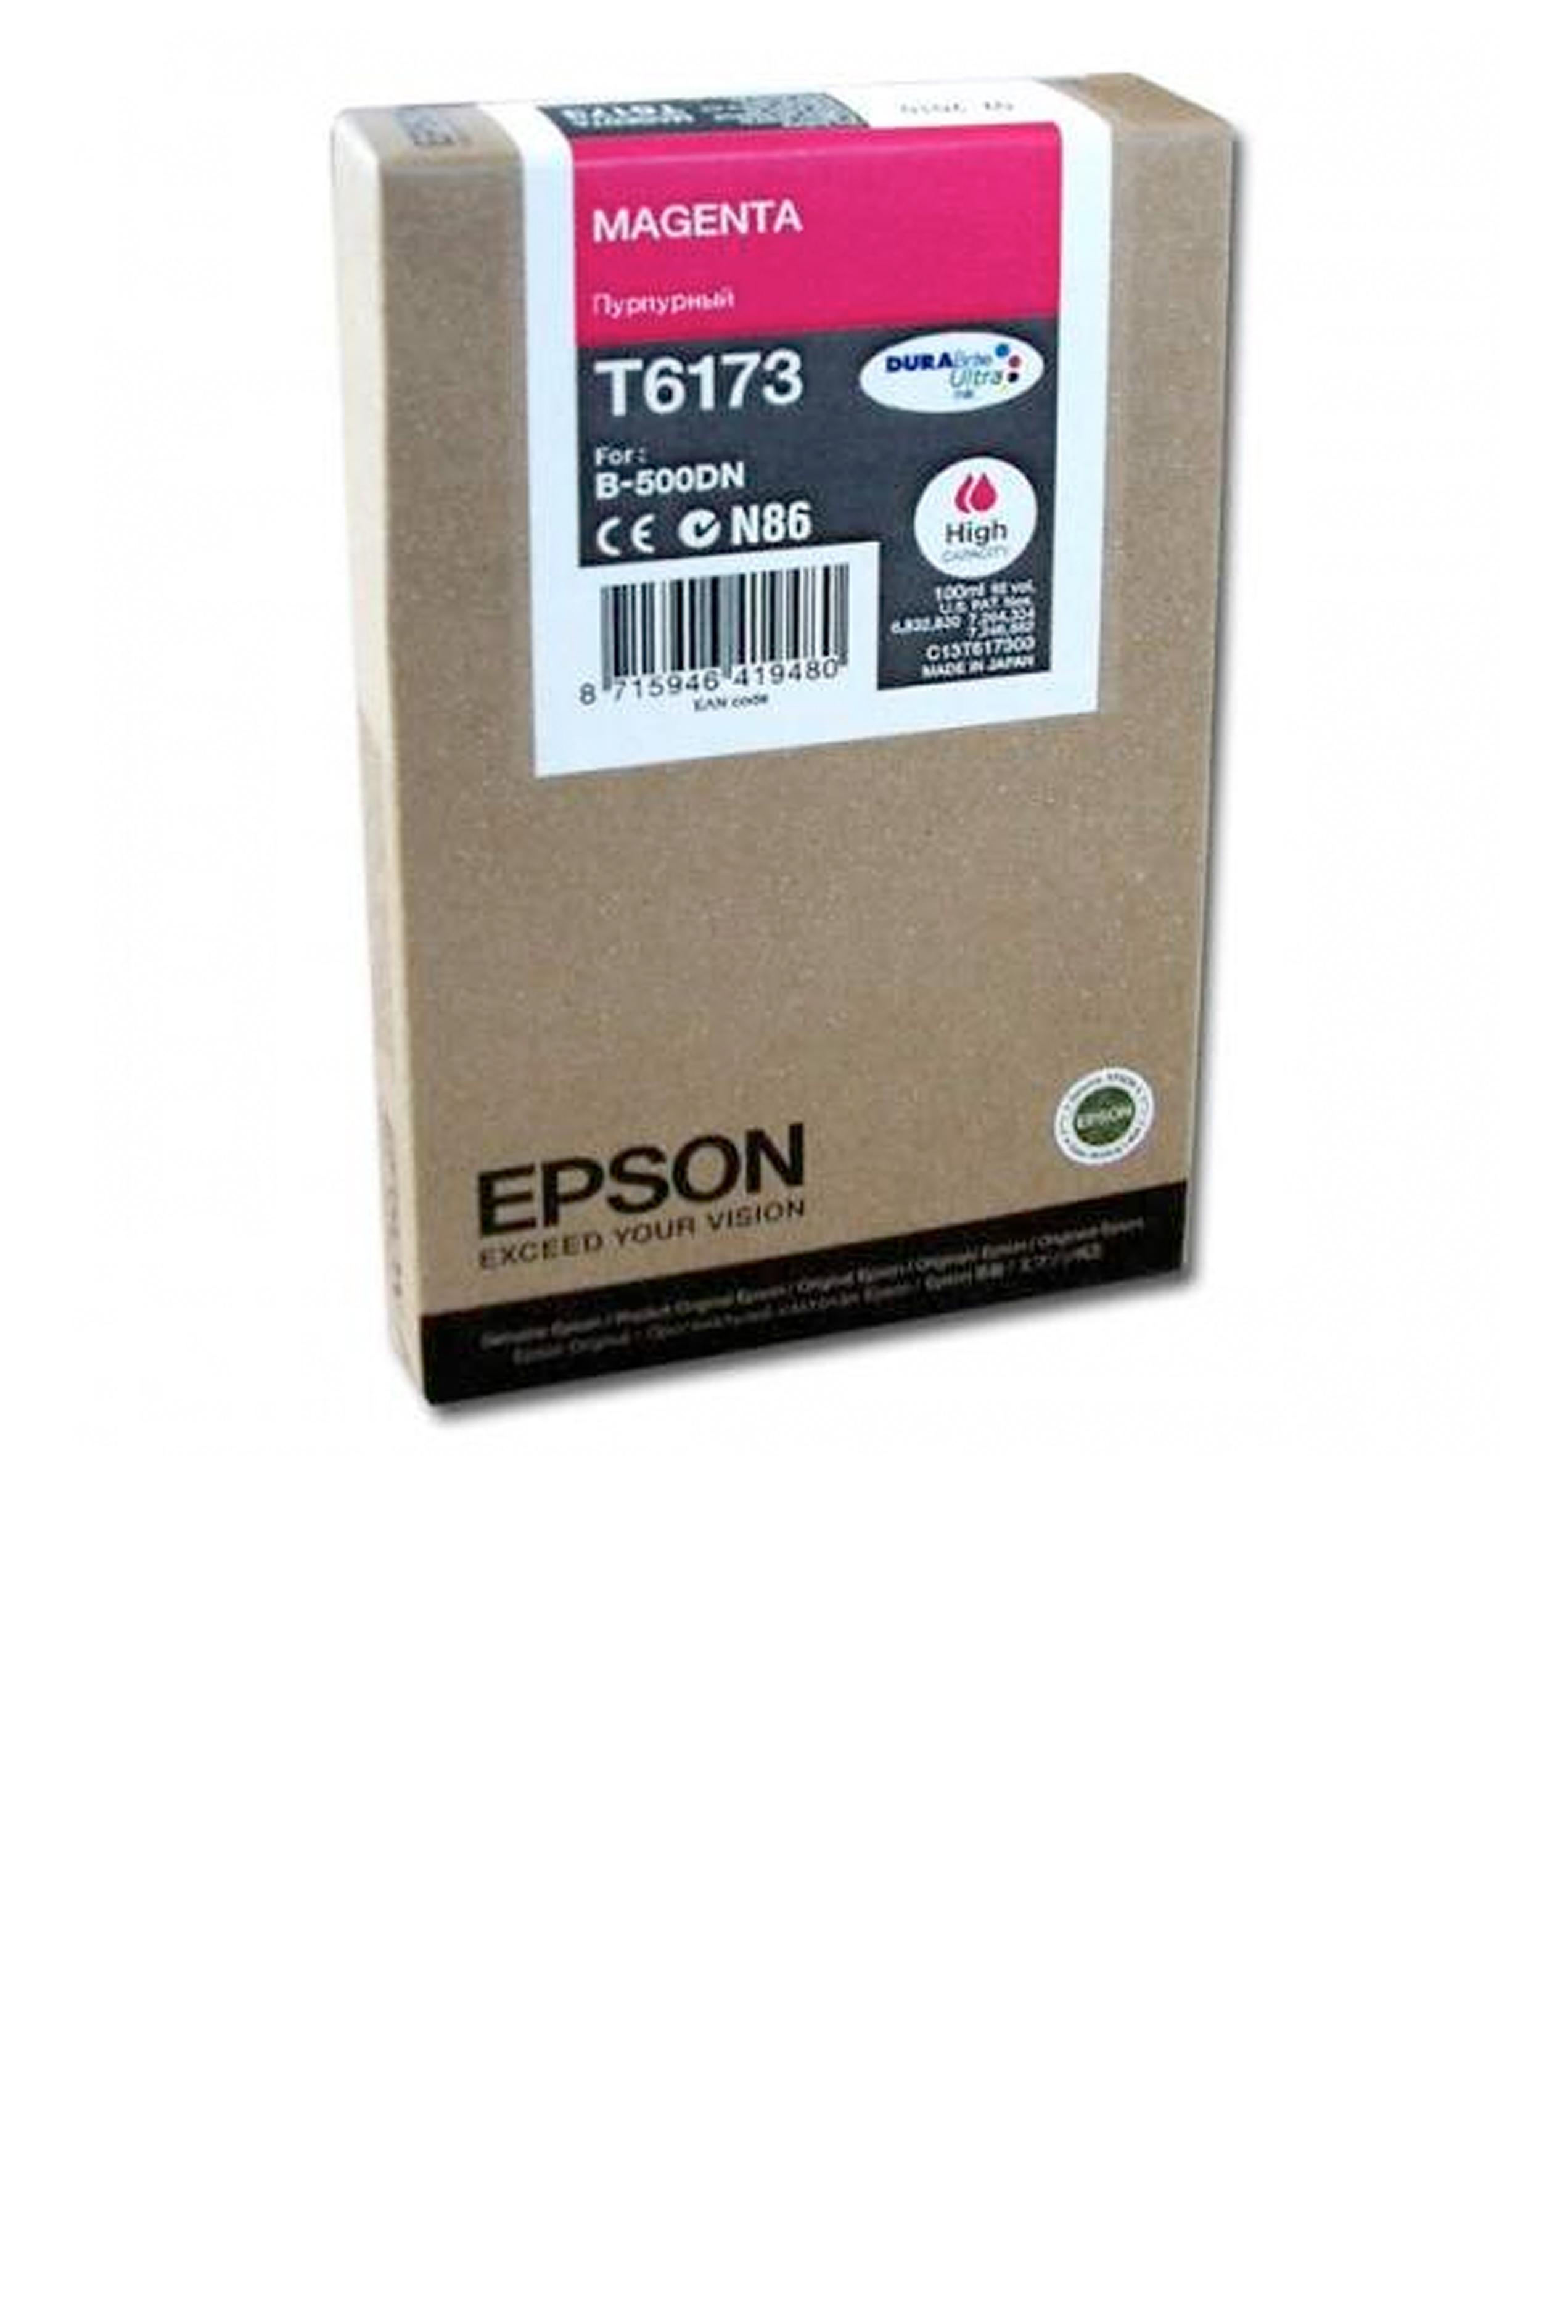 Epson EPSON HI MAGENTA INK (7000) (T617300)